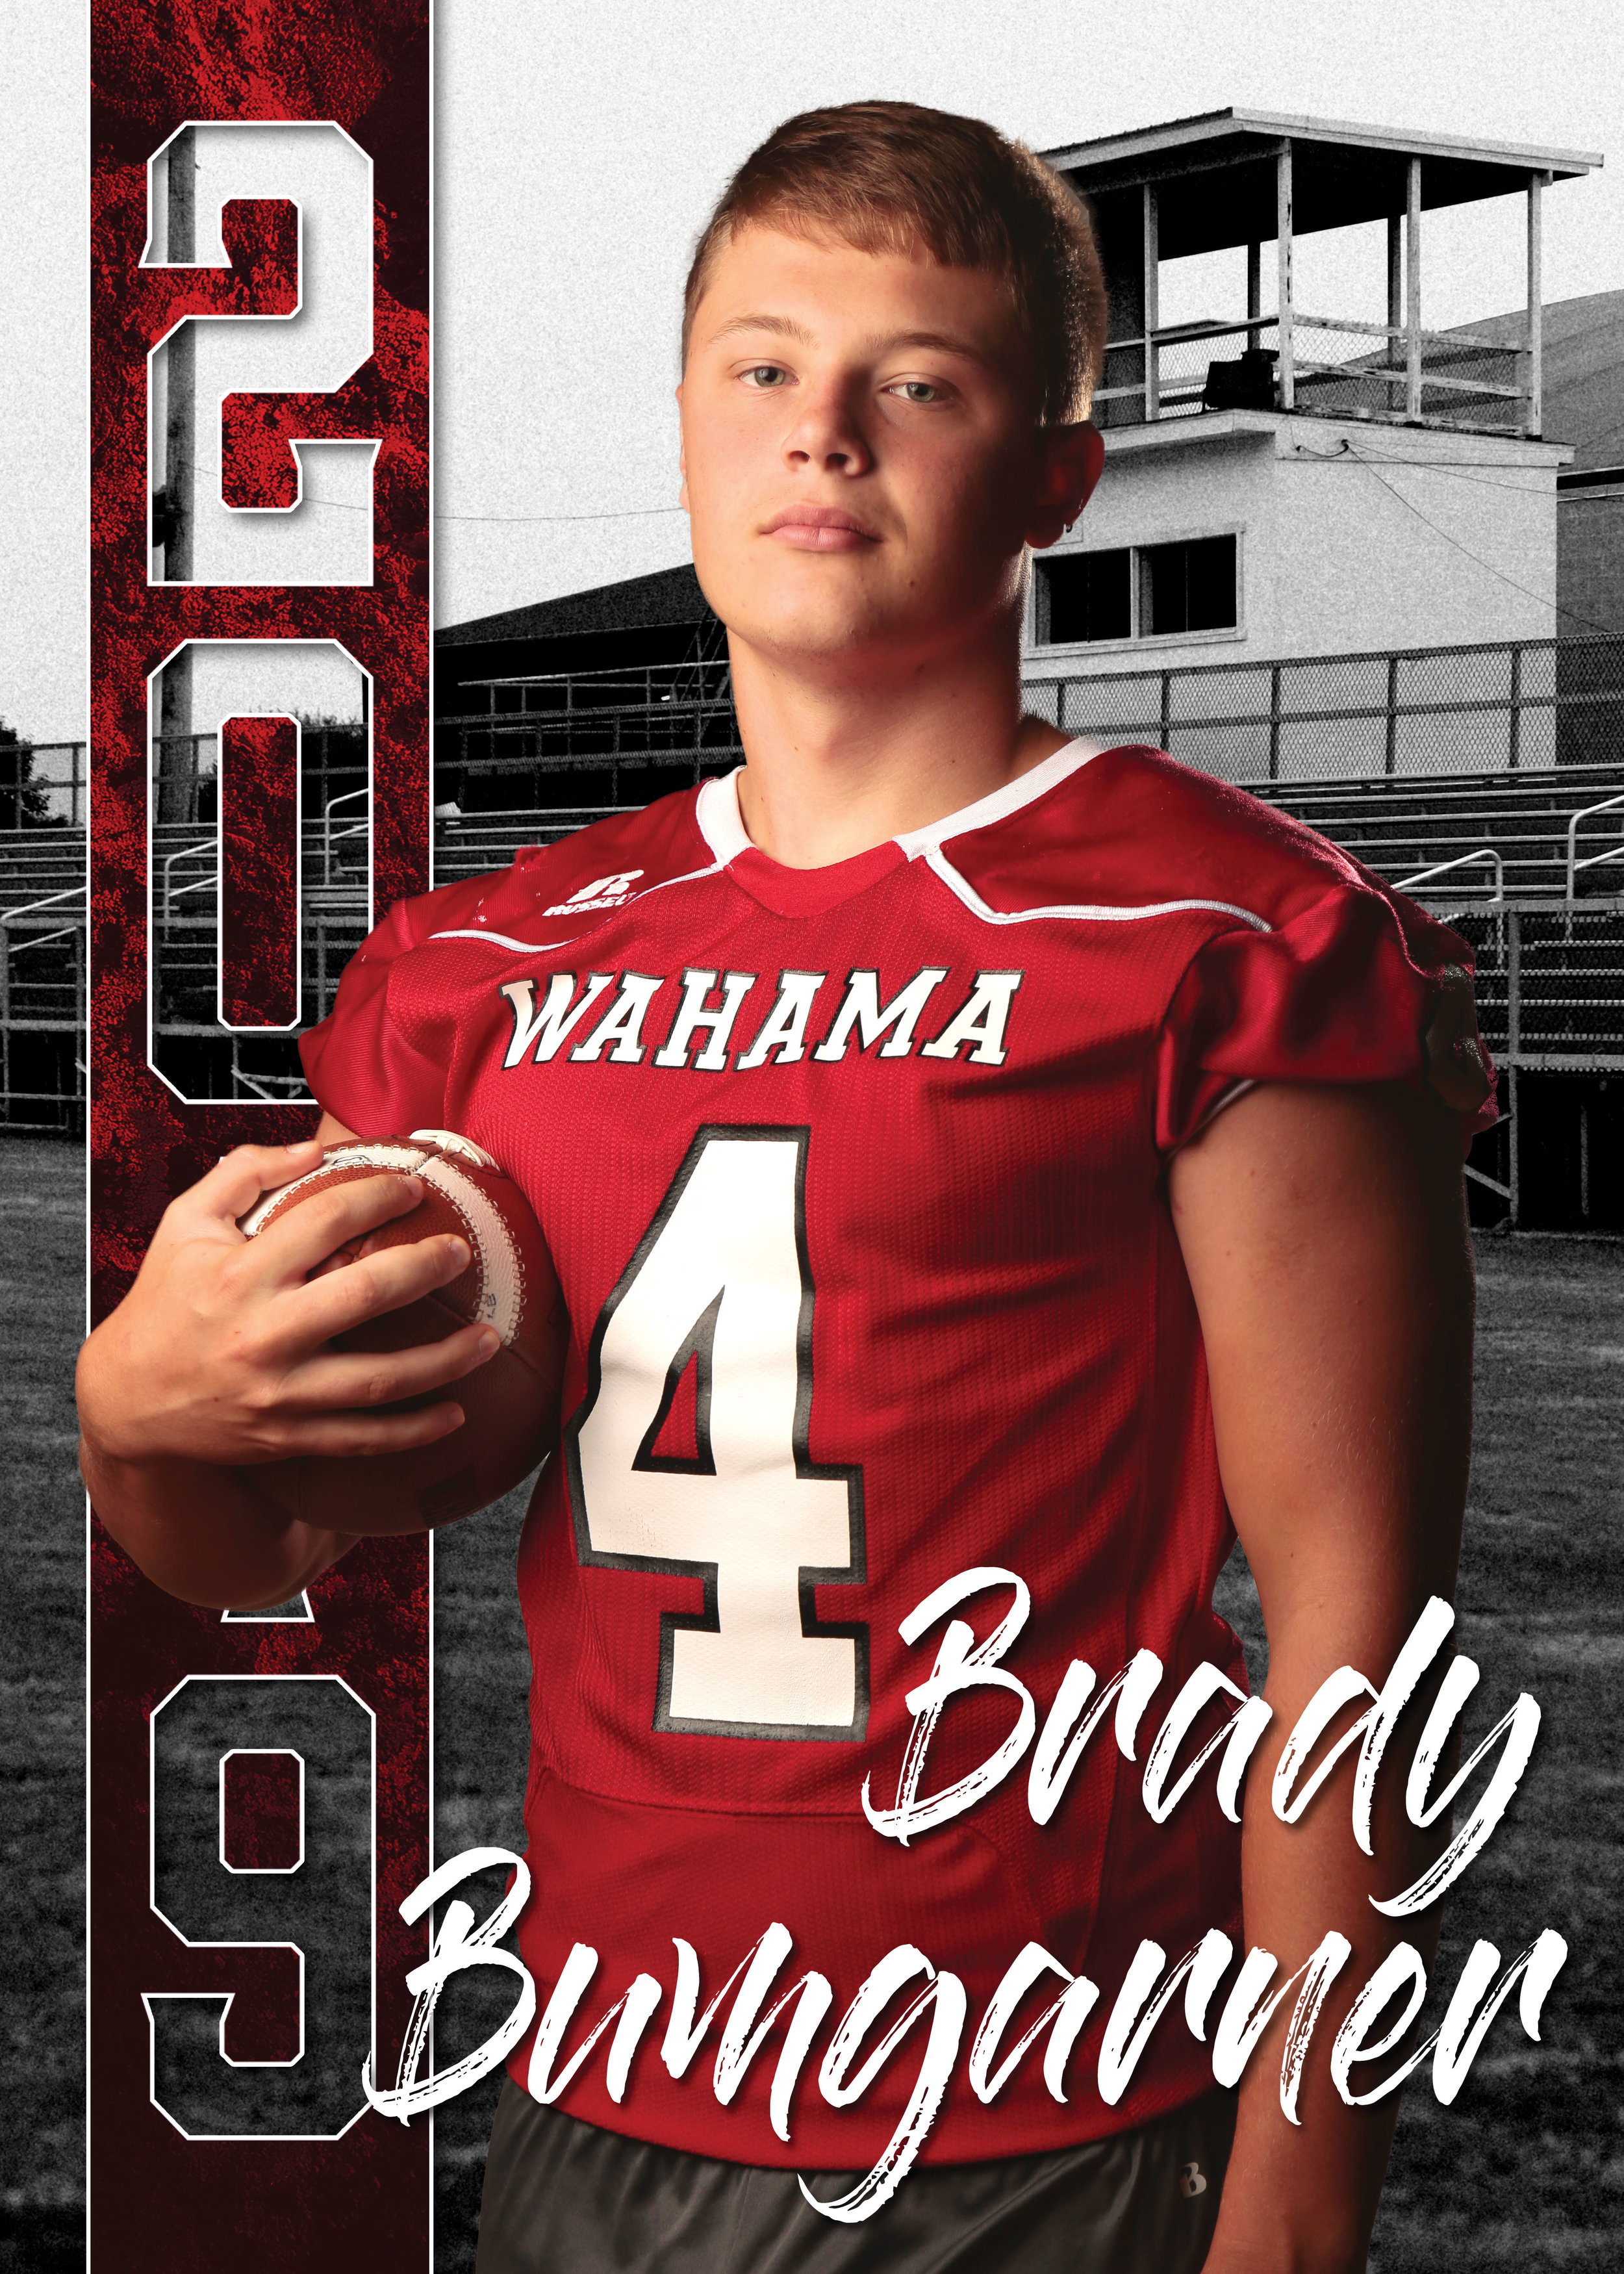 Brady Bumgarner.jpg